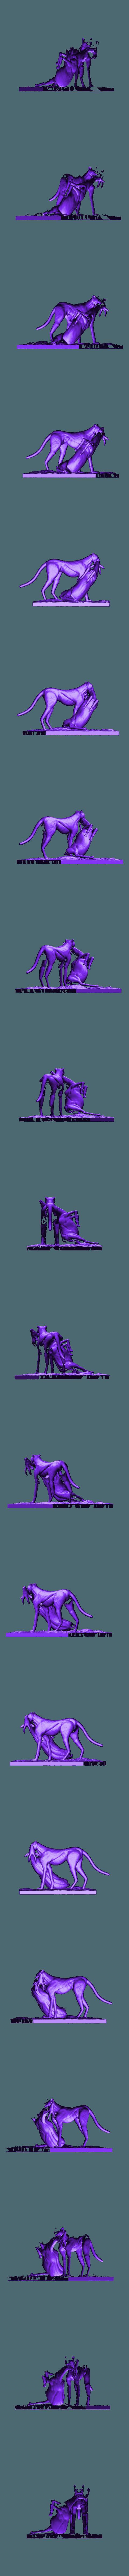 Hunt_scene.stl Download free STL file Cheetah and Gazelle scene • 3D printing design, CarlCreates